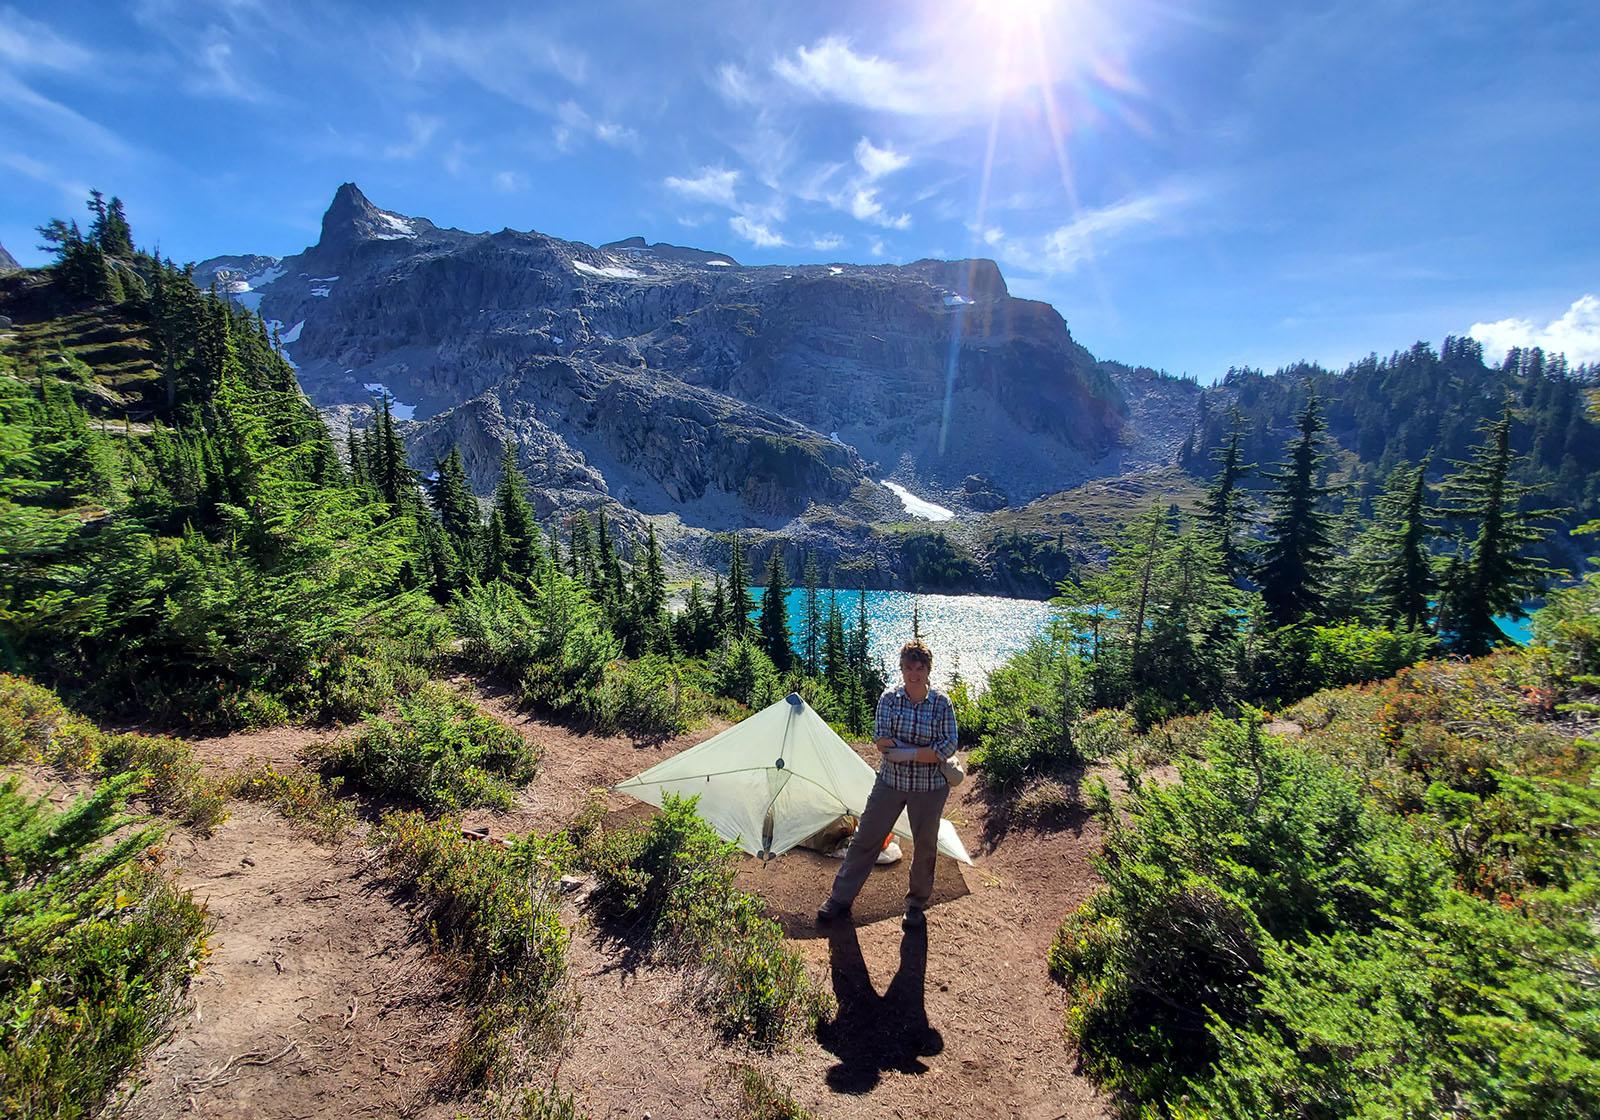 Trail Talk Interview: Victoria Livschitz